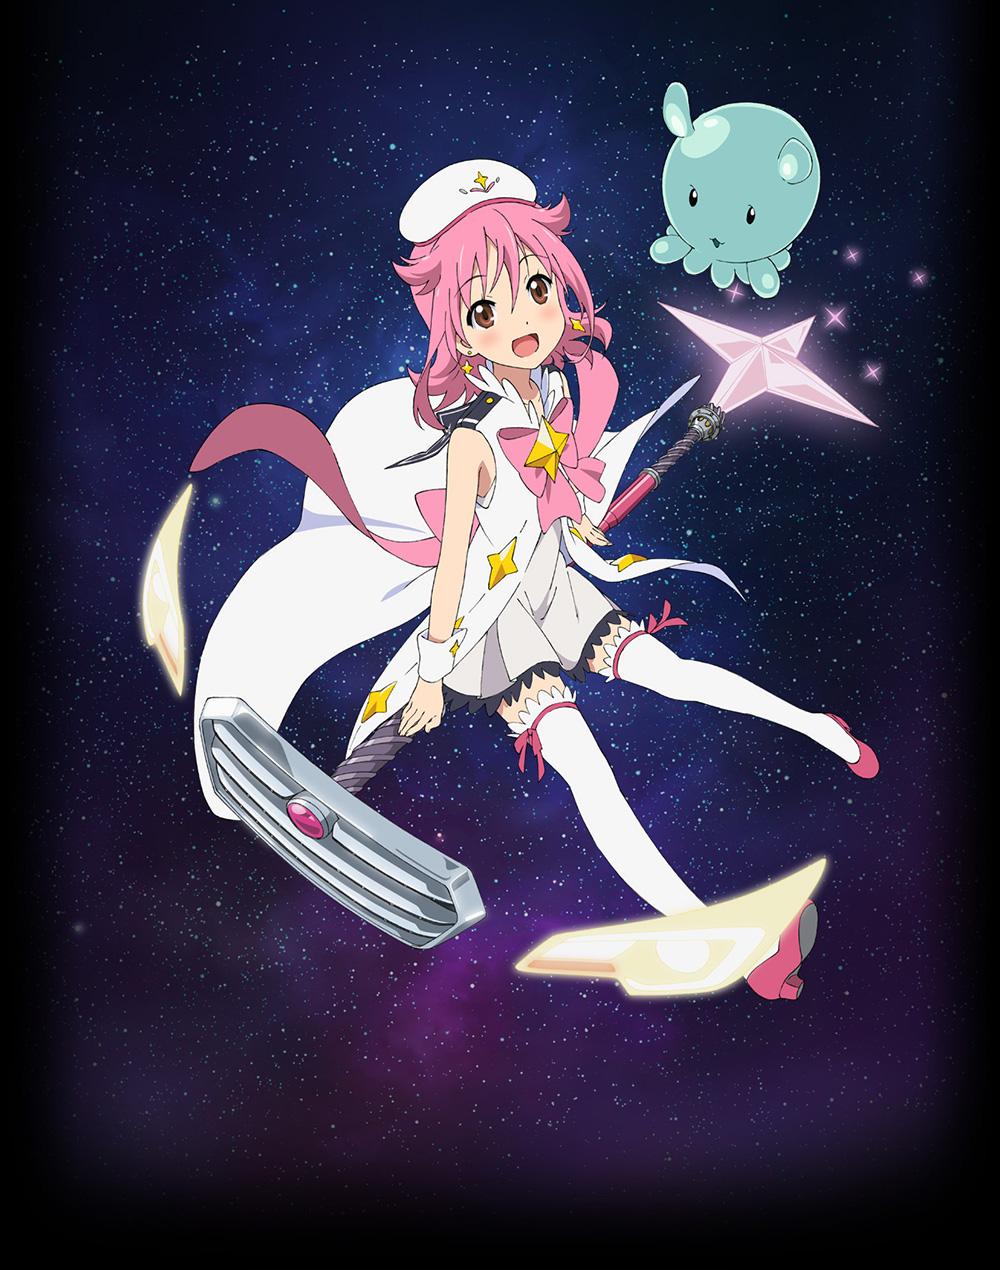 Houkago-no-Pleiades-TV-Anime-Character-Visual-Subaru